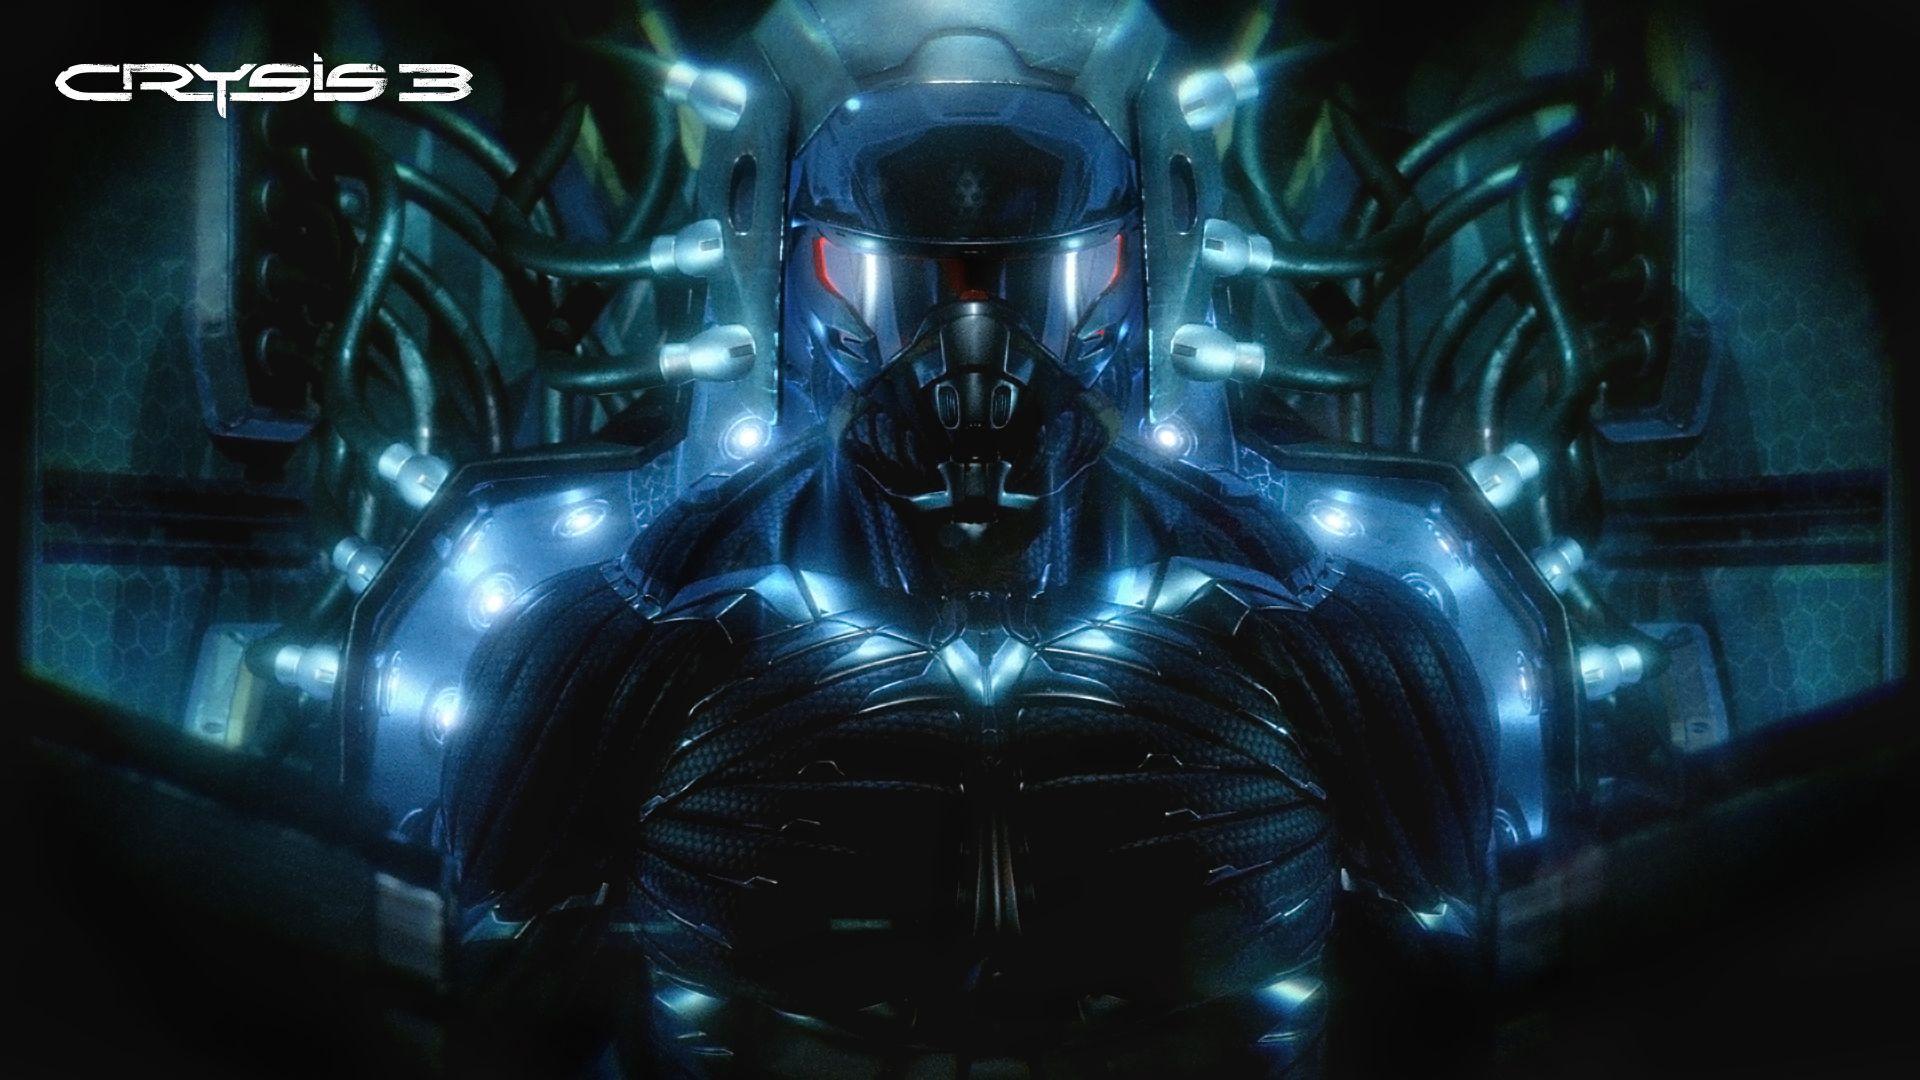 Dojmy z multiplayerové bety Crysis 3 74364